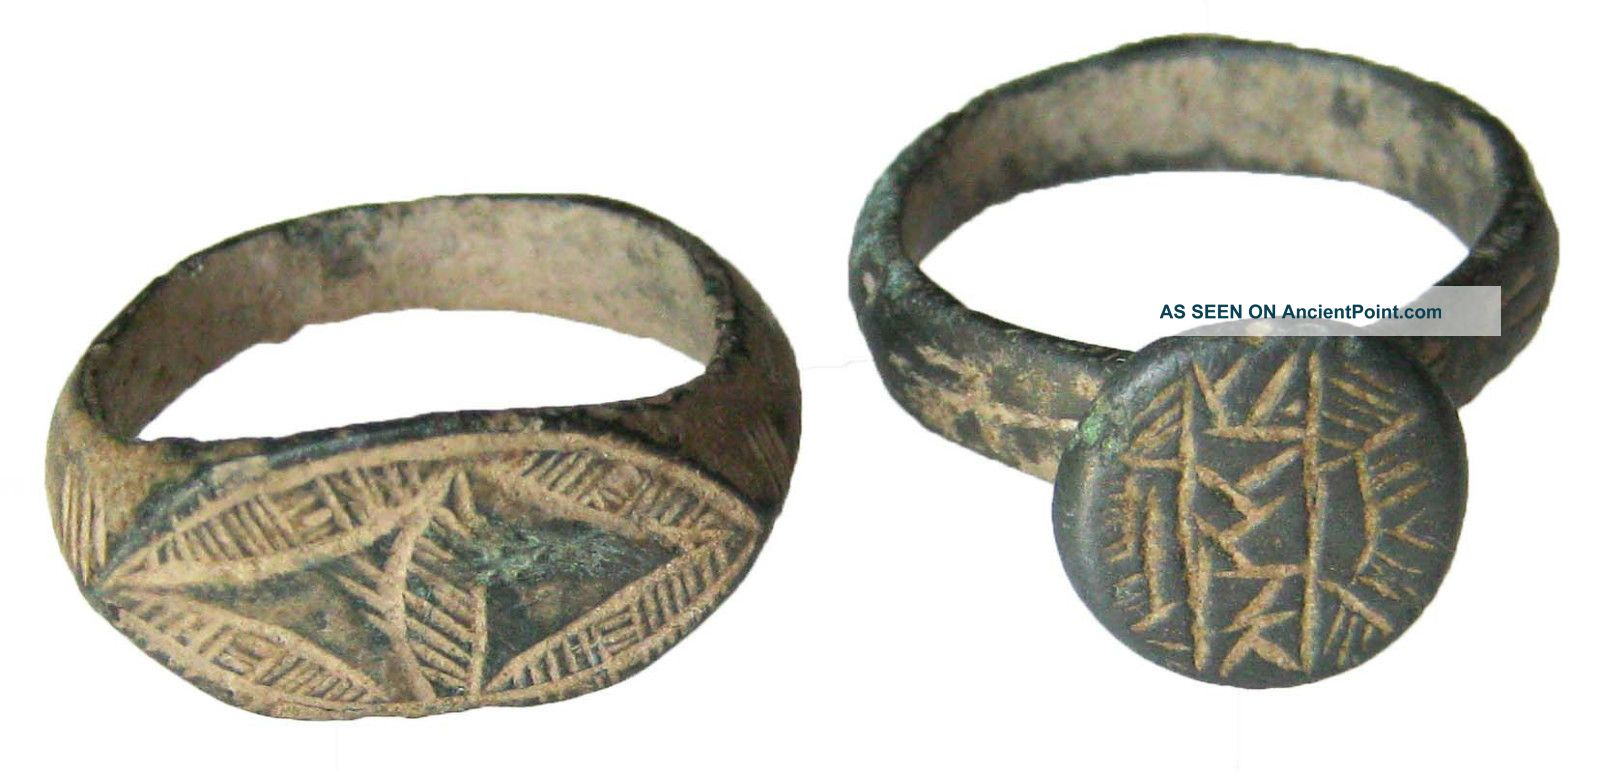 2 Roman Rings Bronze And Bellon  3.90g/22mm  5.10g/26mm     R-317 Roman photo